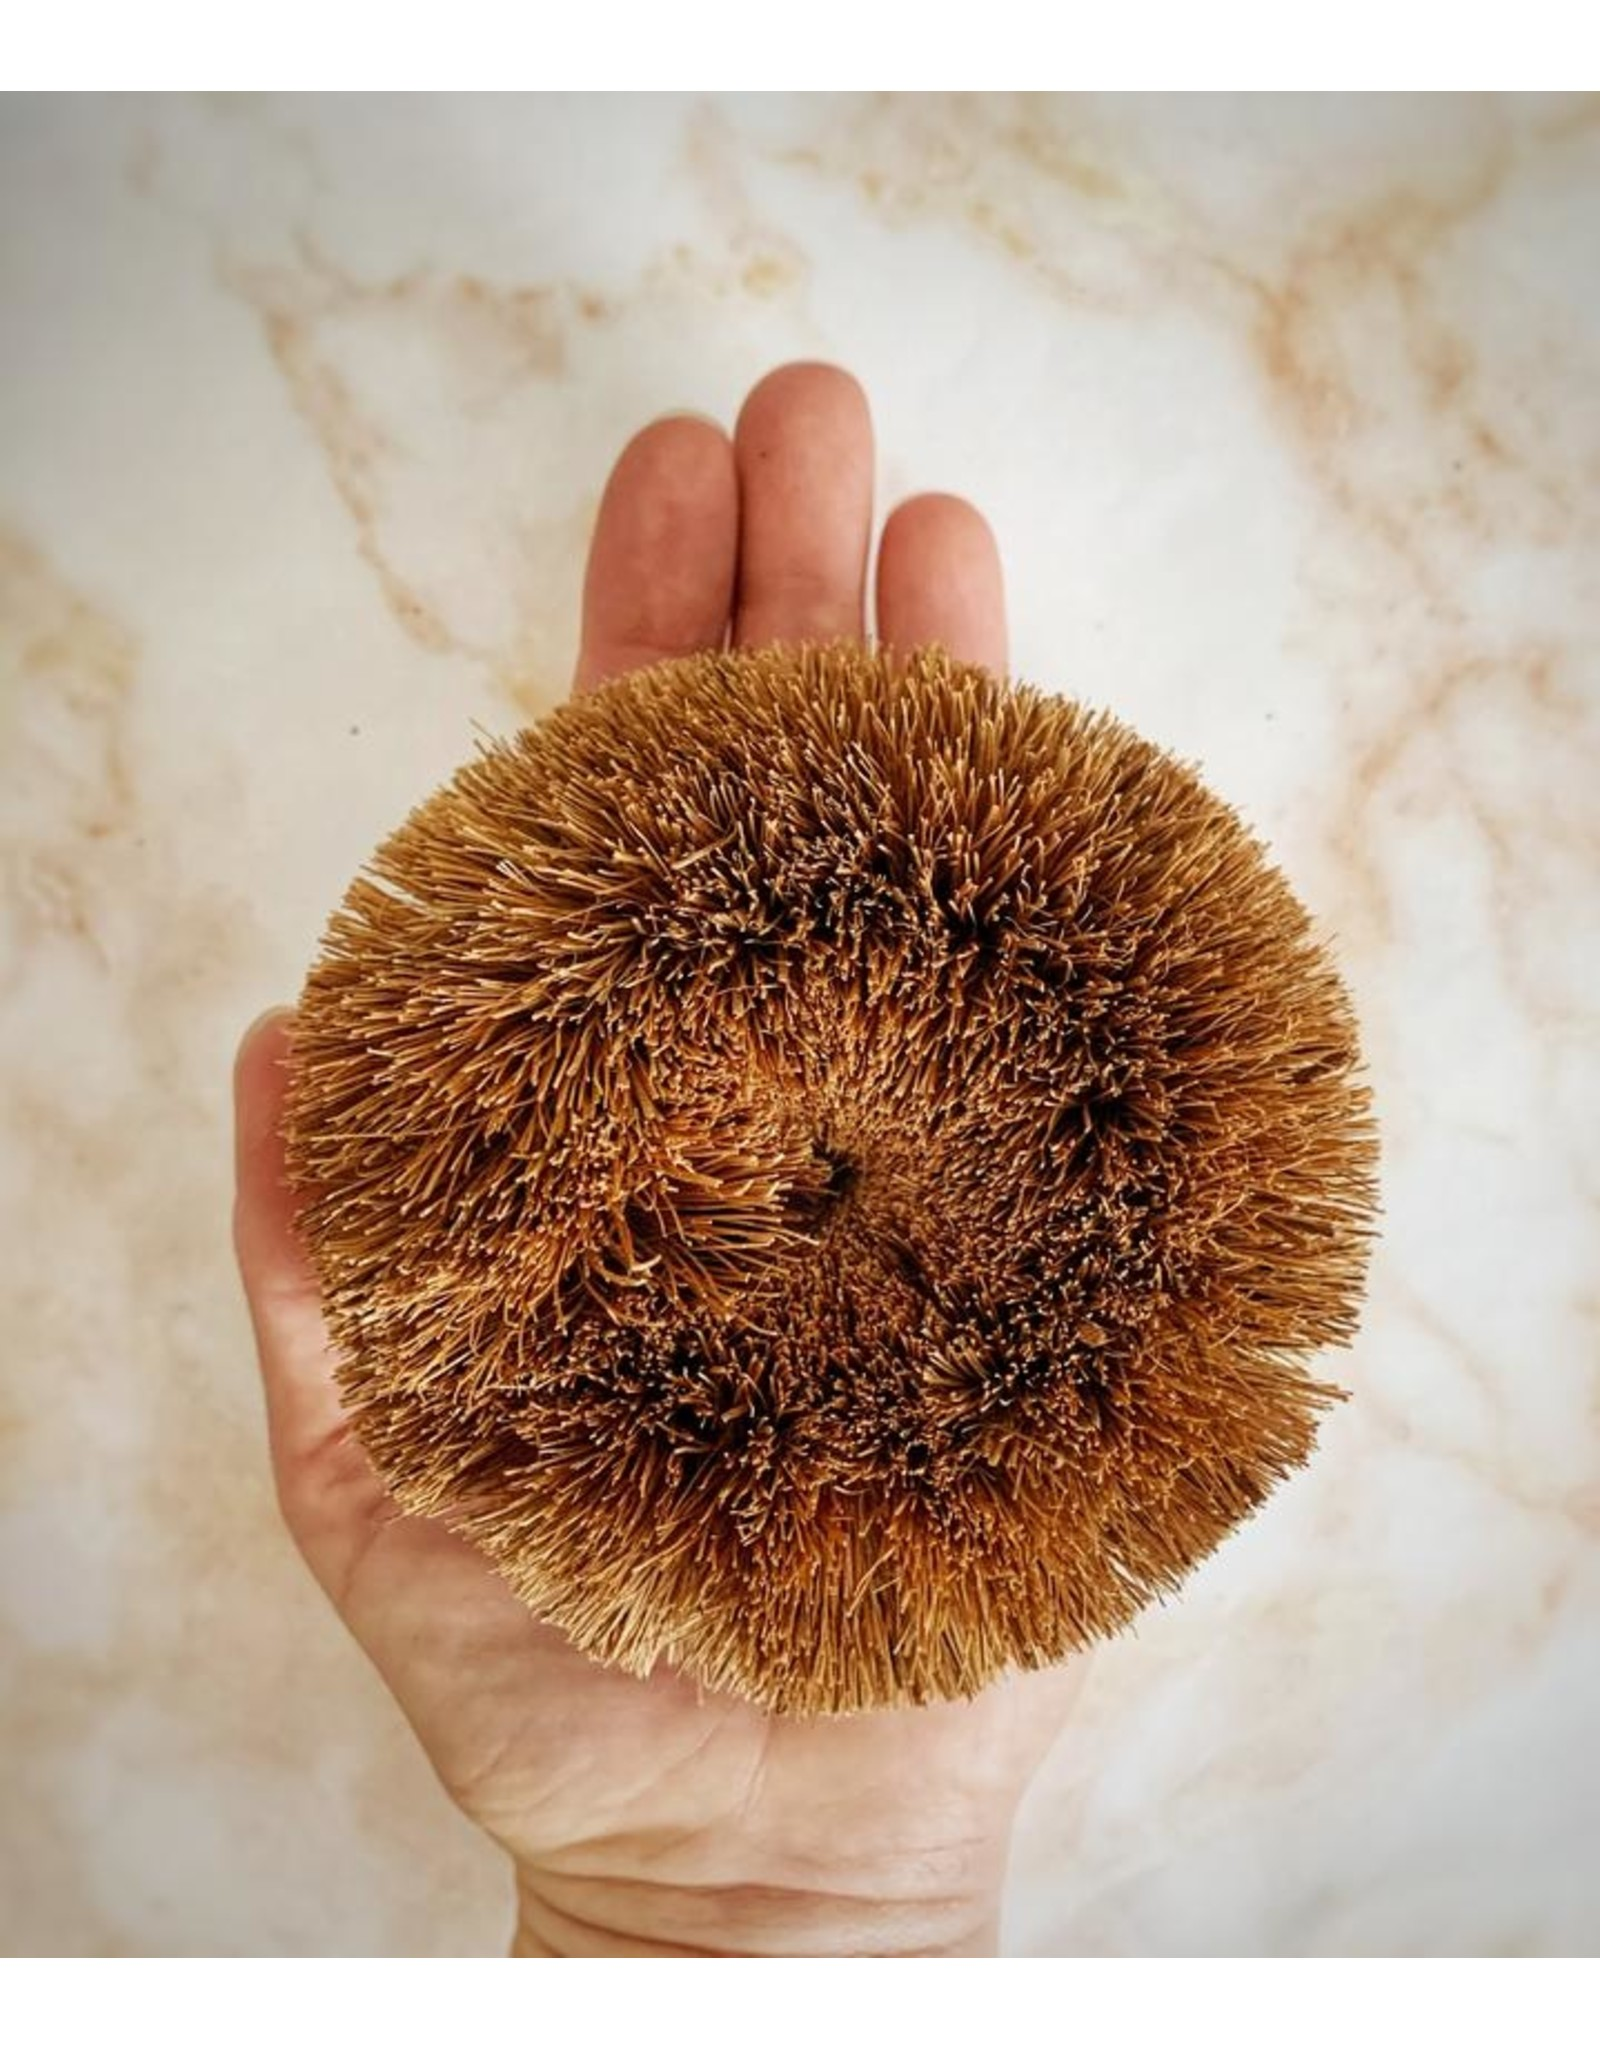 Round Coconut Scrubbie